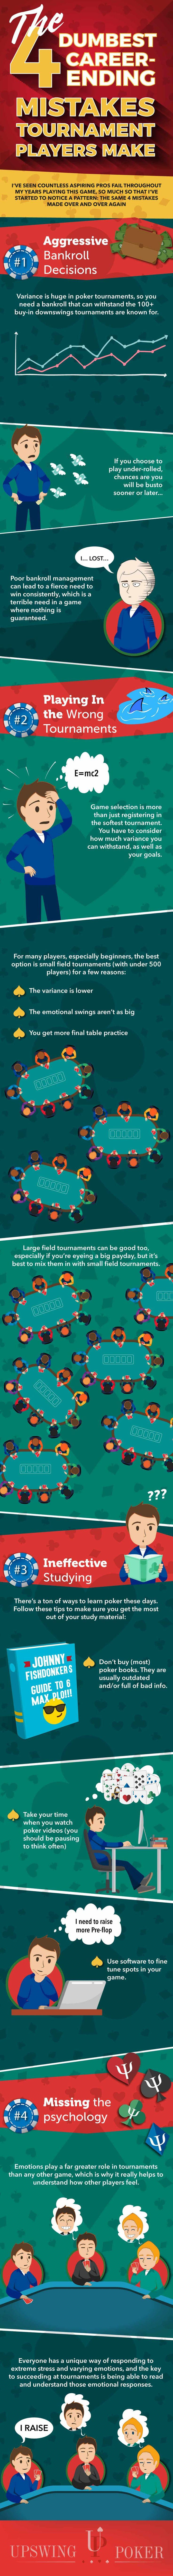 4 Career-Ending Mistakes Tournament Poker Players Make